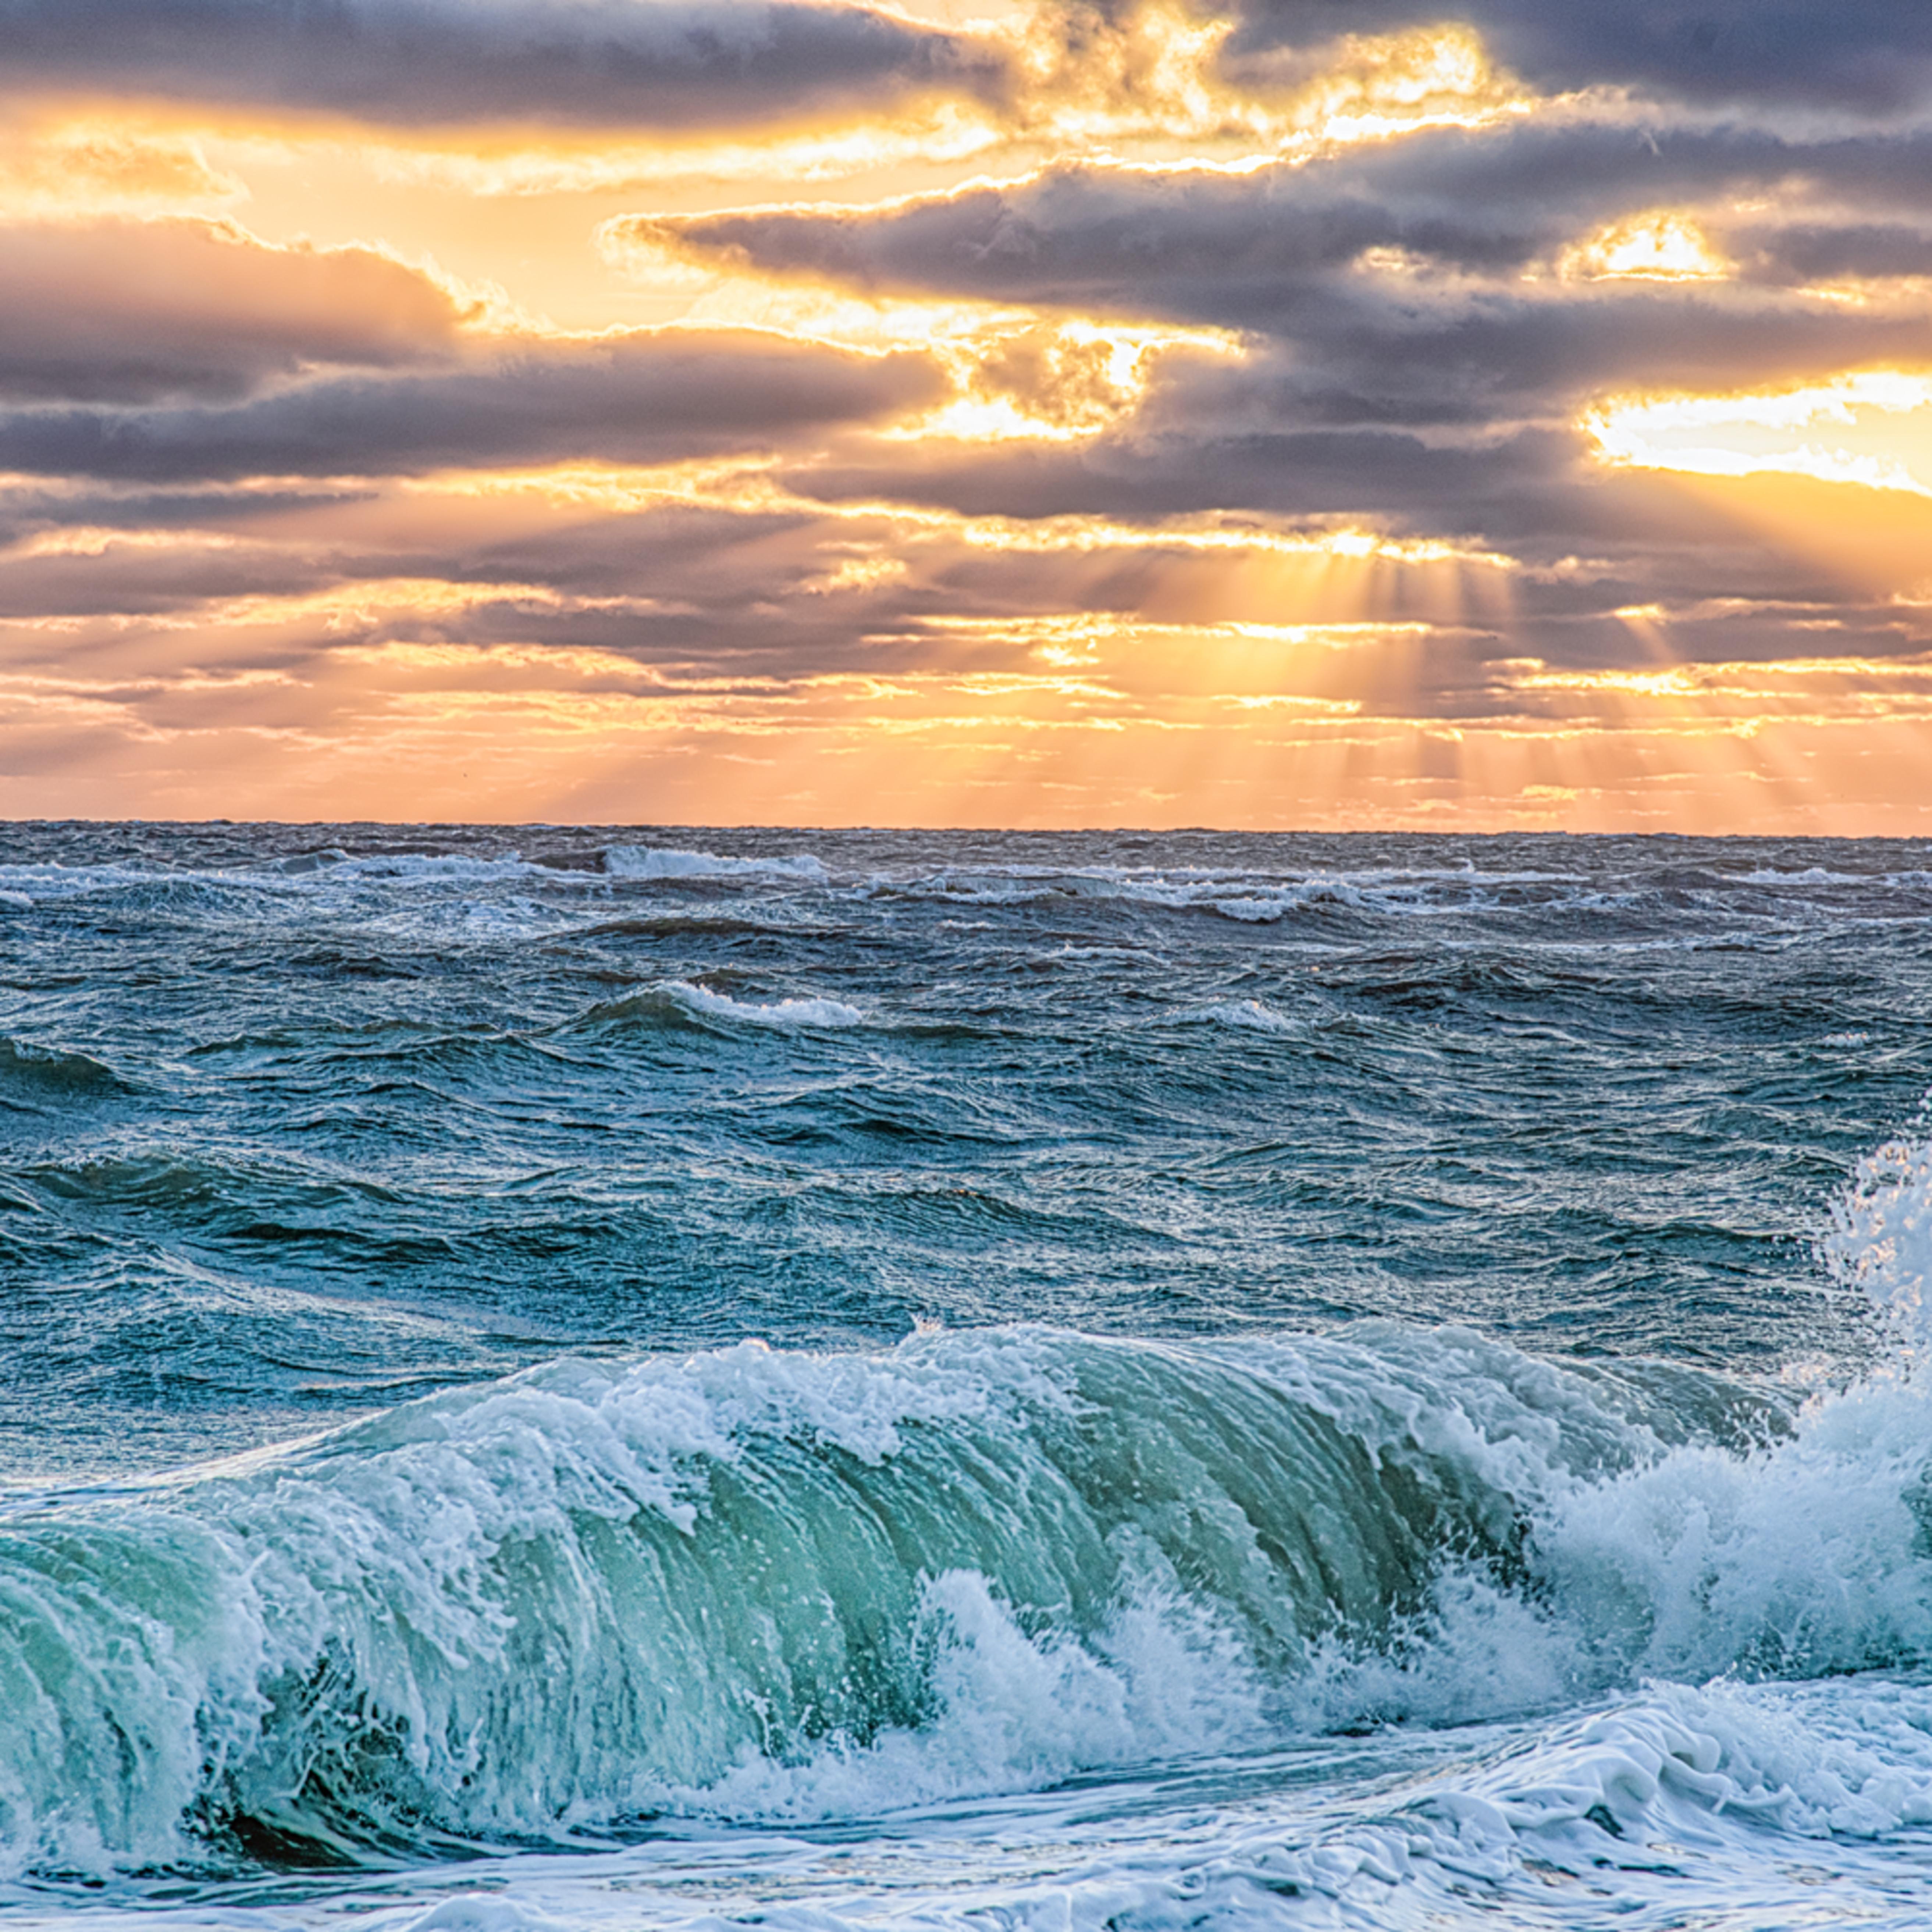 South beach fall sunbeams and crashing wave tzkcwe